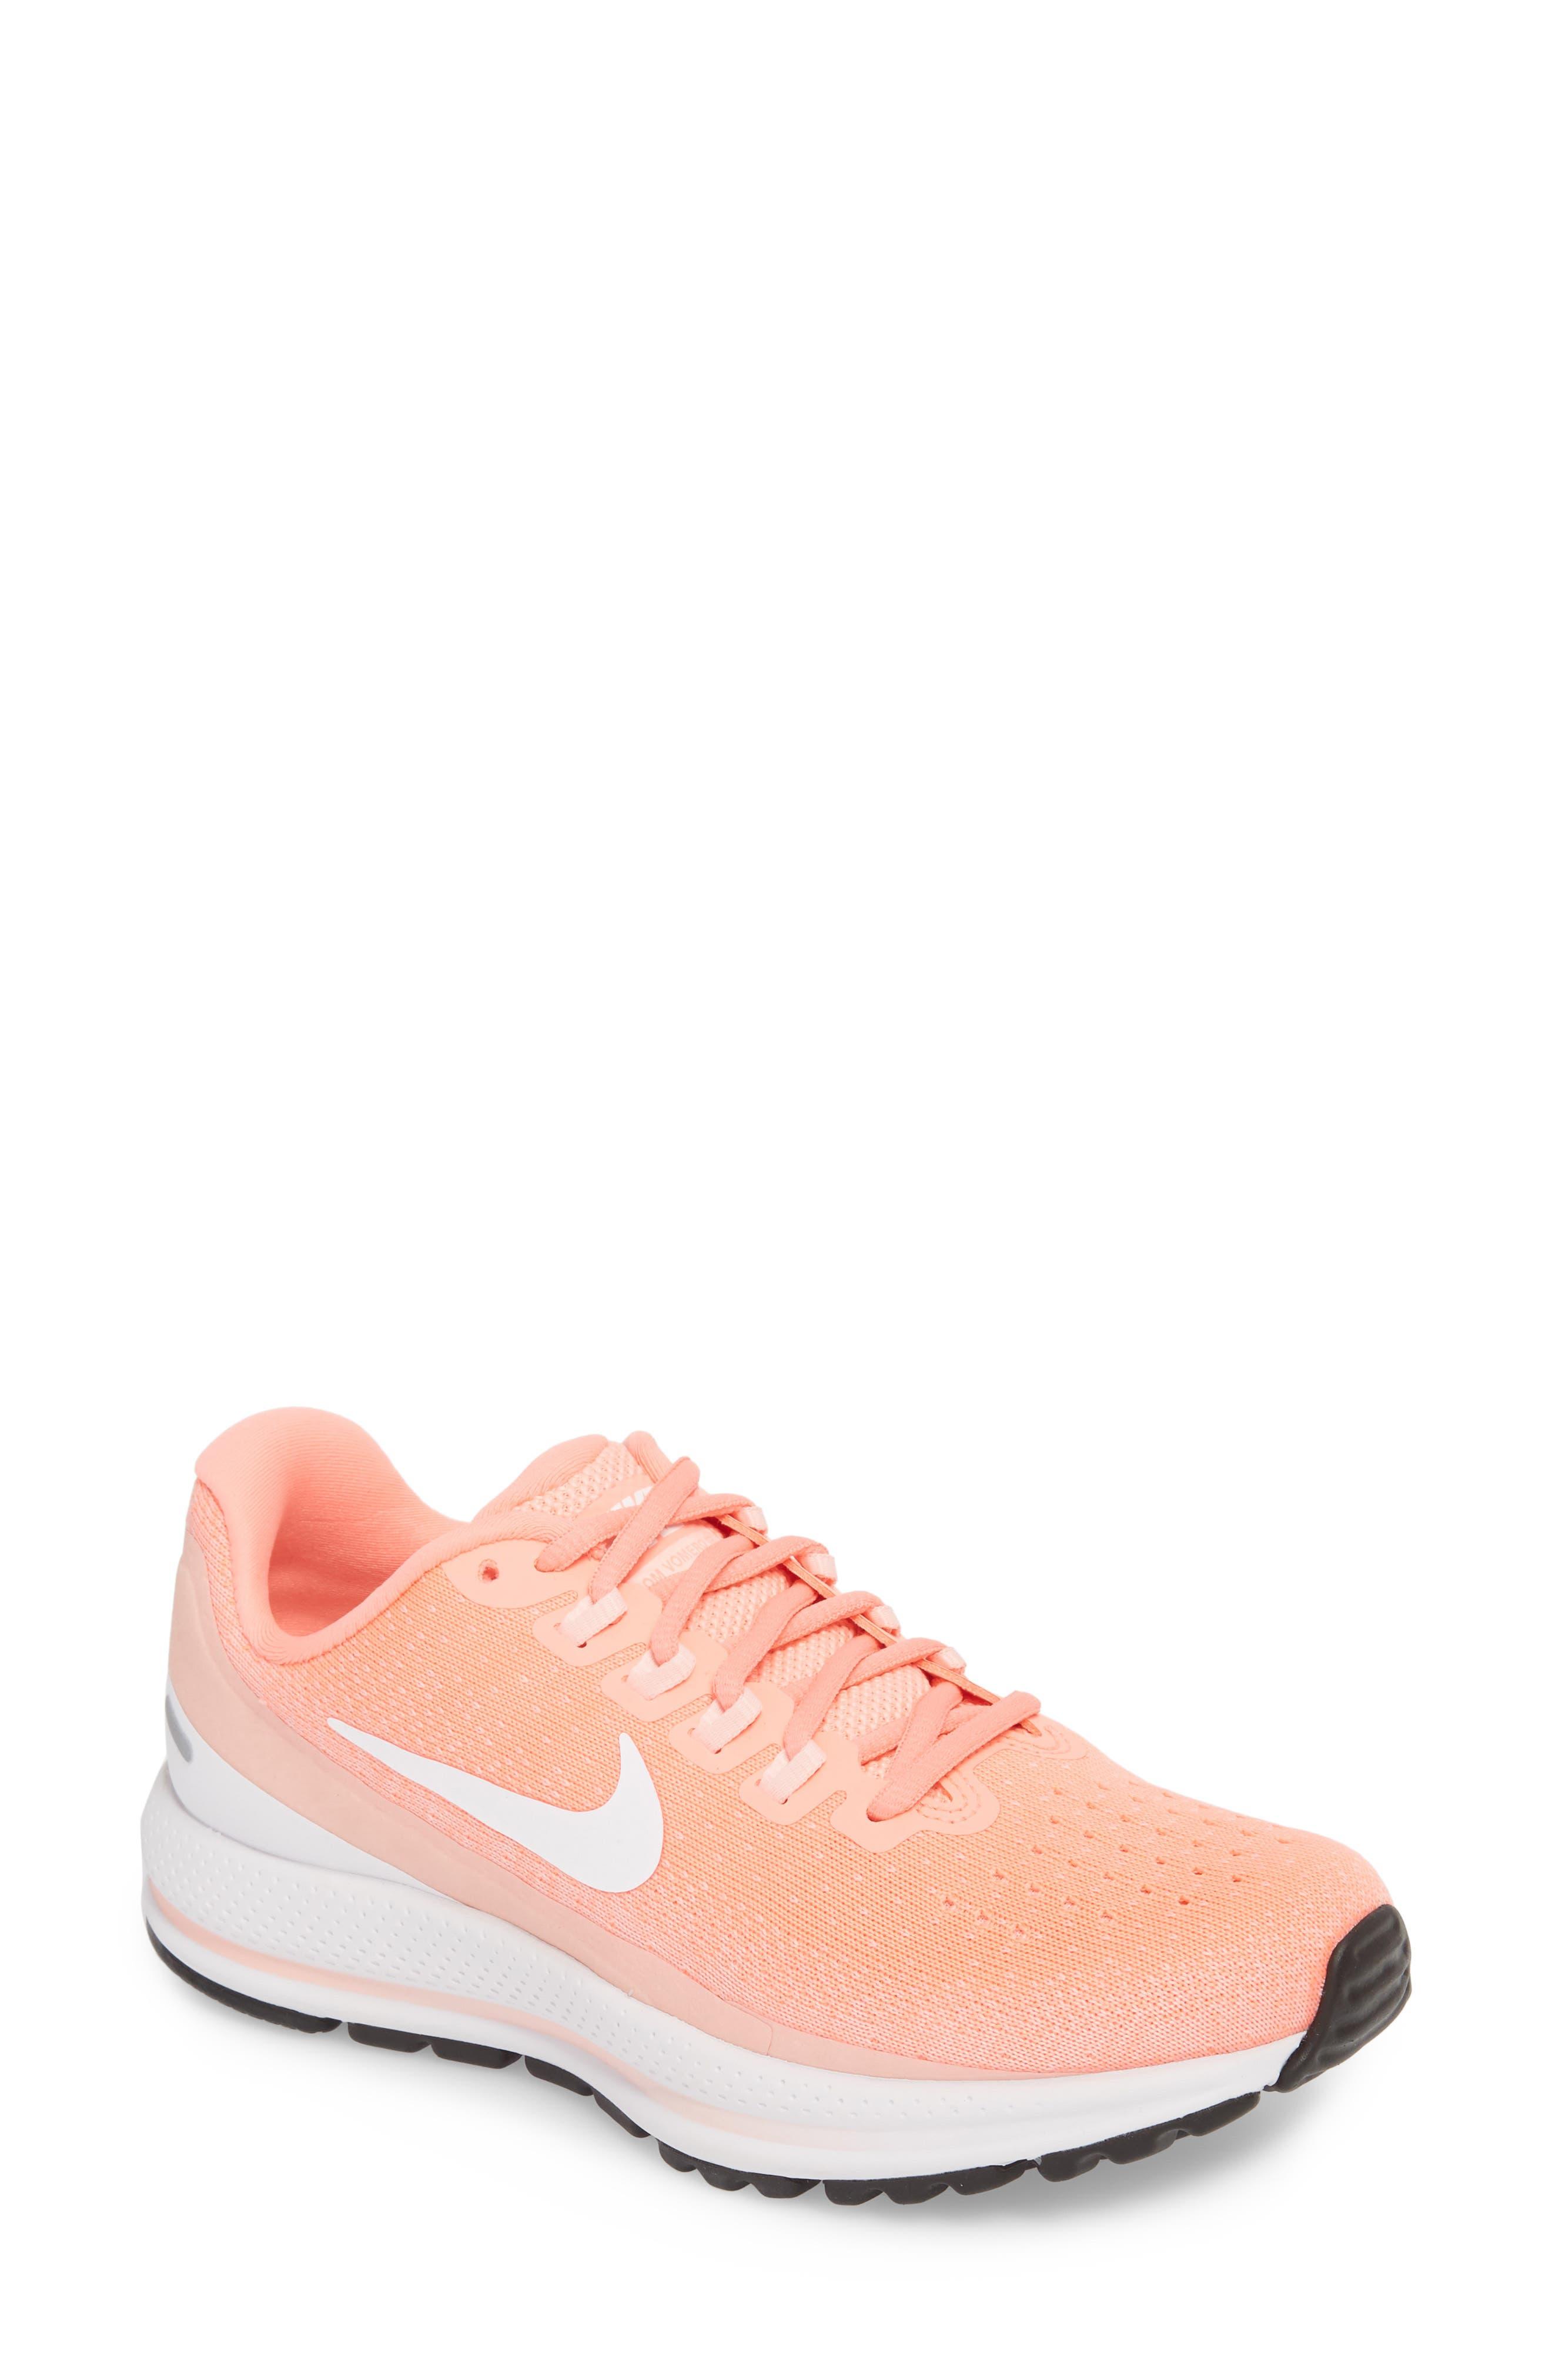 Air Zoom Vomero 13 Running Shoe,                             Main thumbnail 9, color,